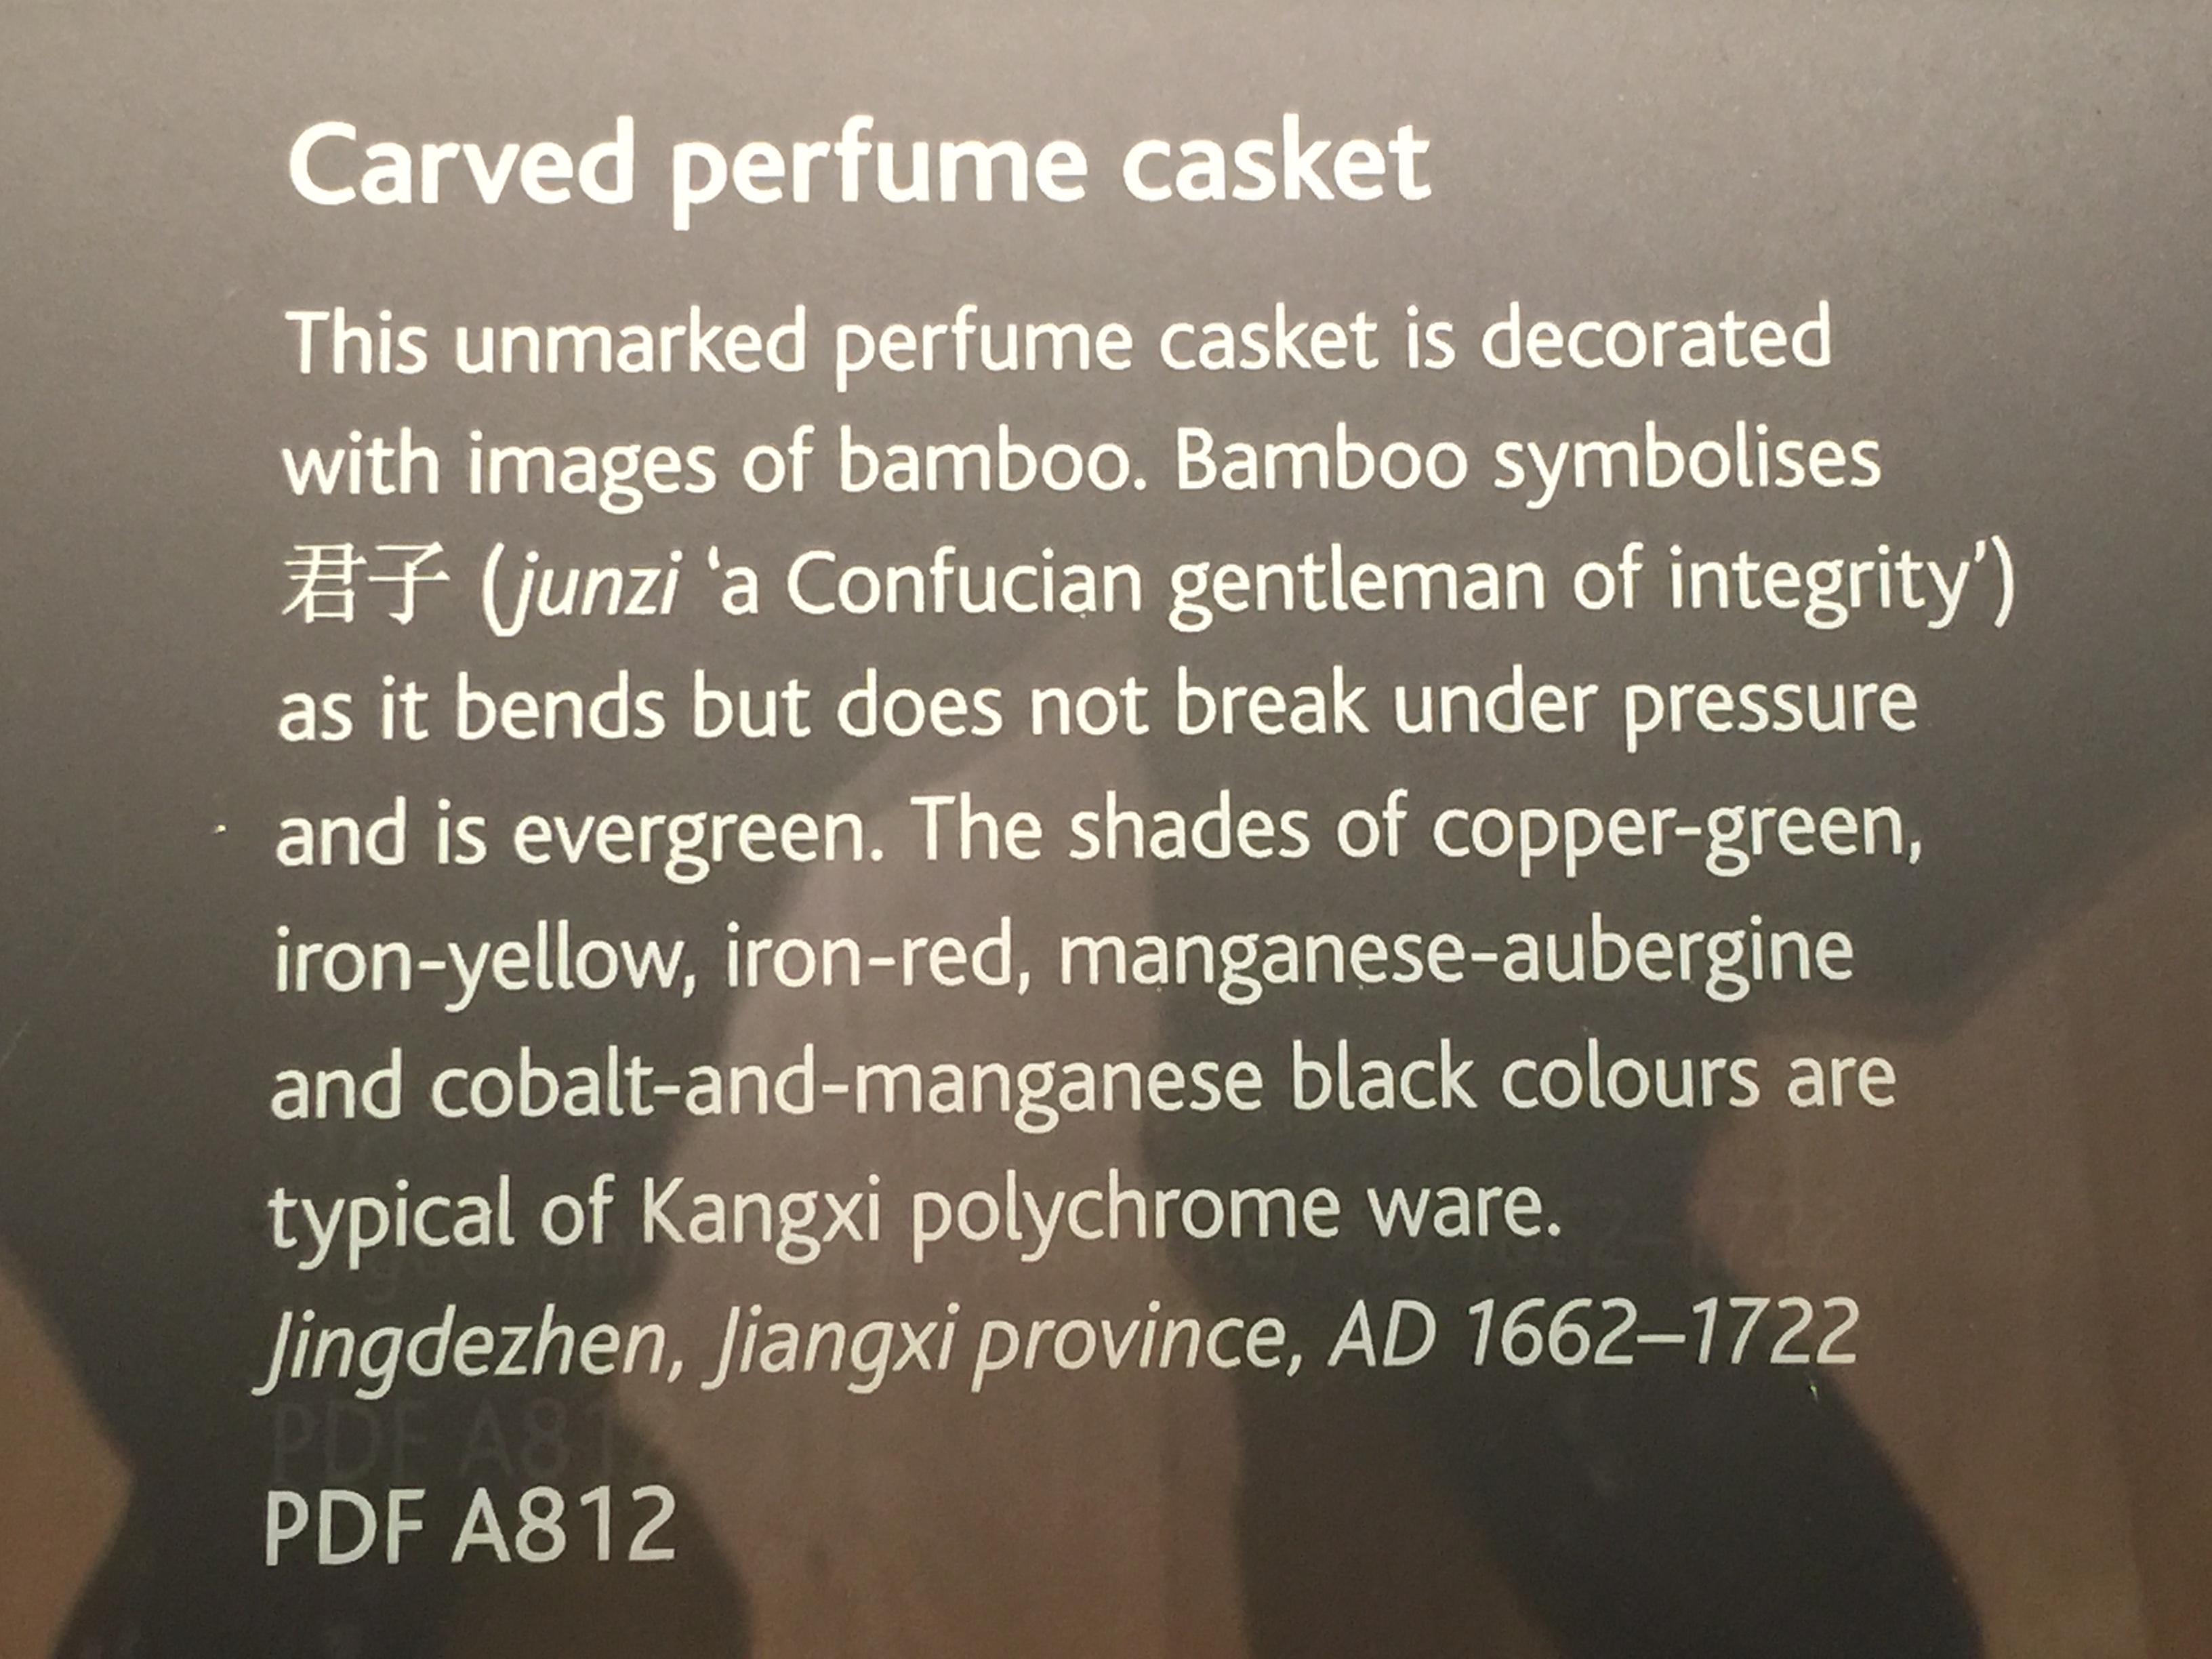 Chinese-Porcelain-British-Museum-Percival-David-jessewaugh.com-135.jpg